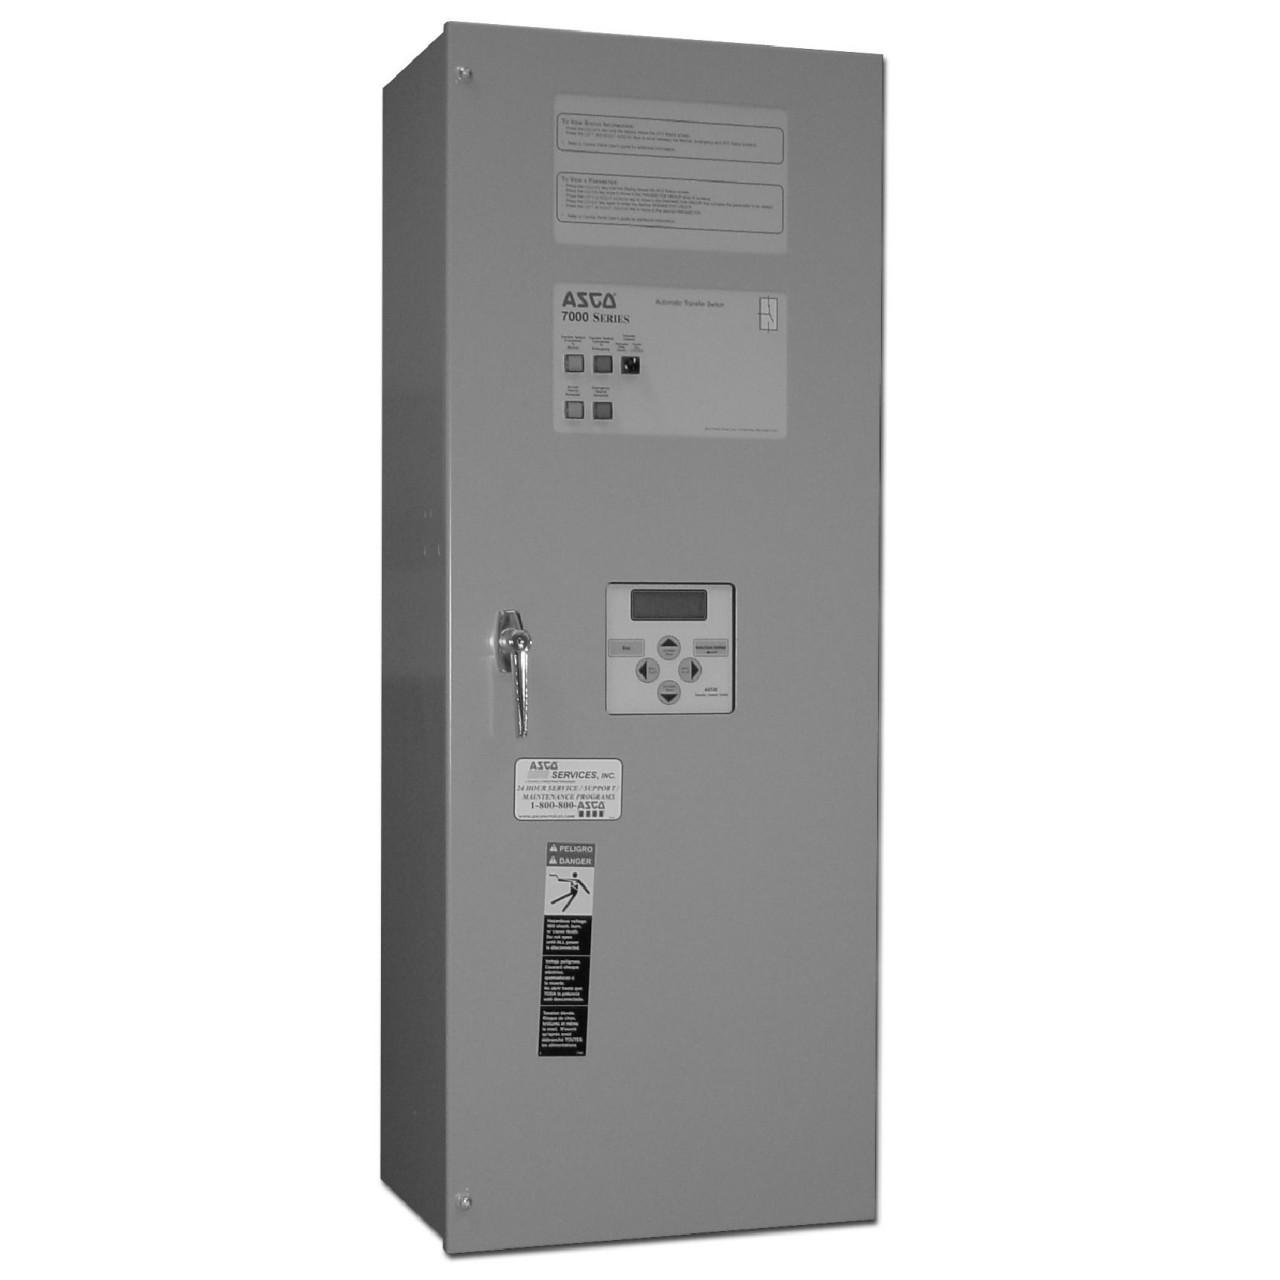 Asco 7000 Manual Transfer Switch (1Ph, 230A)